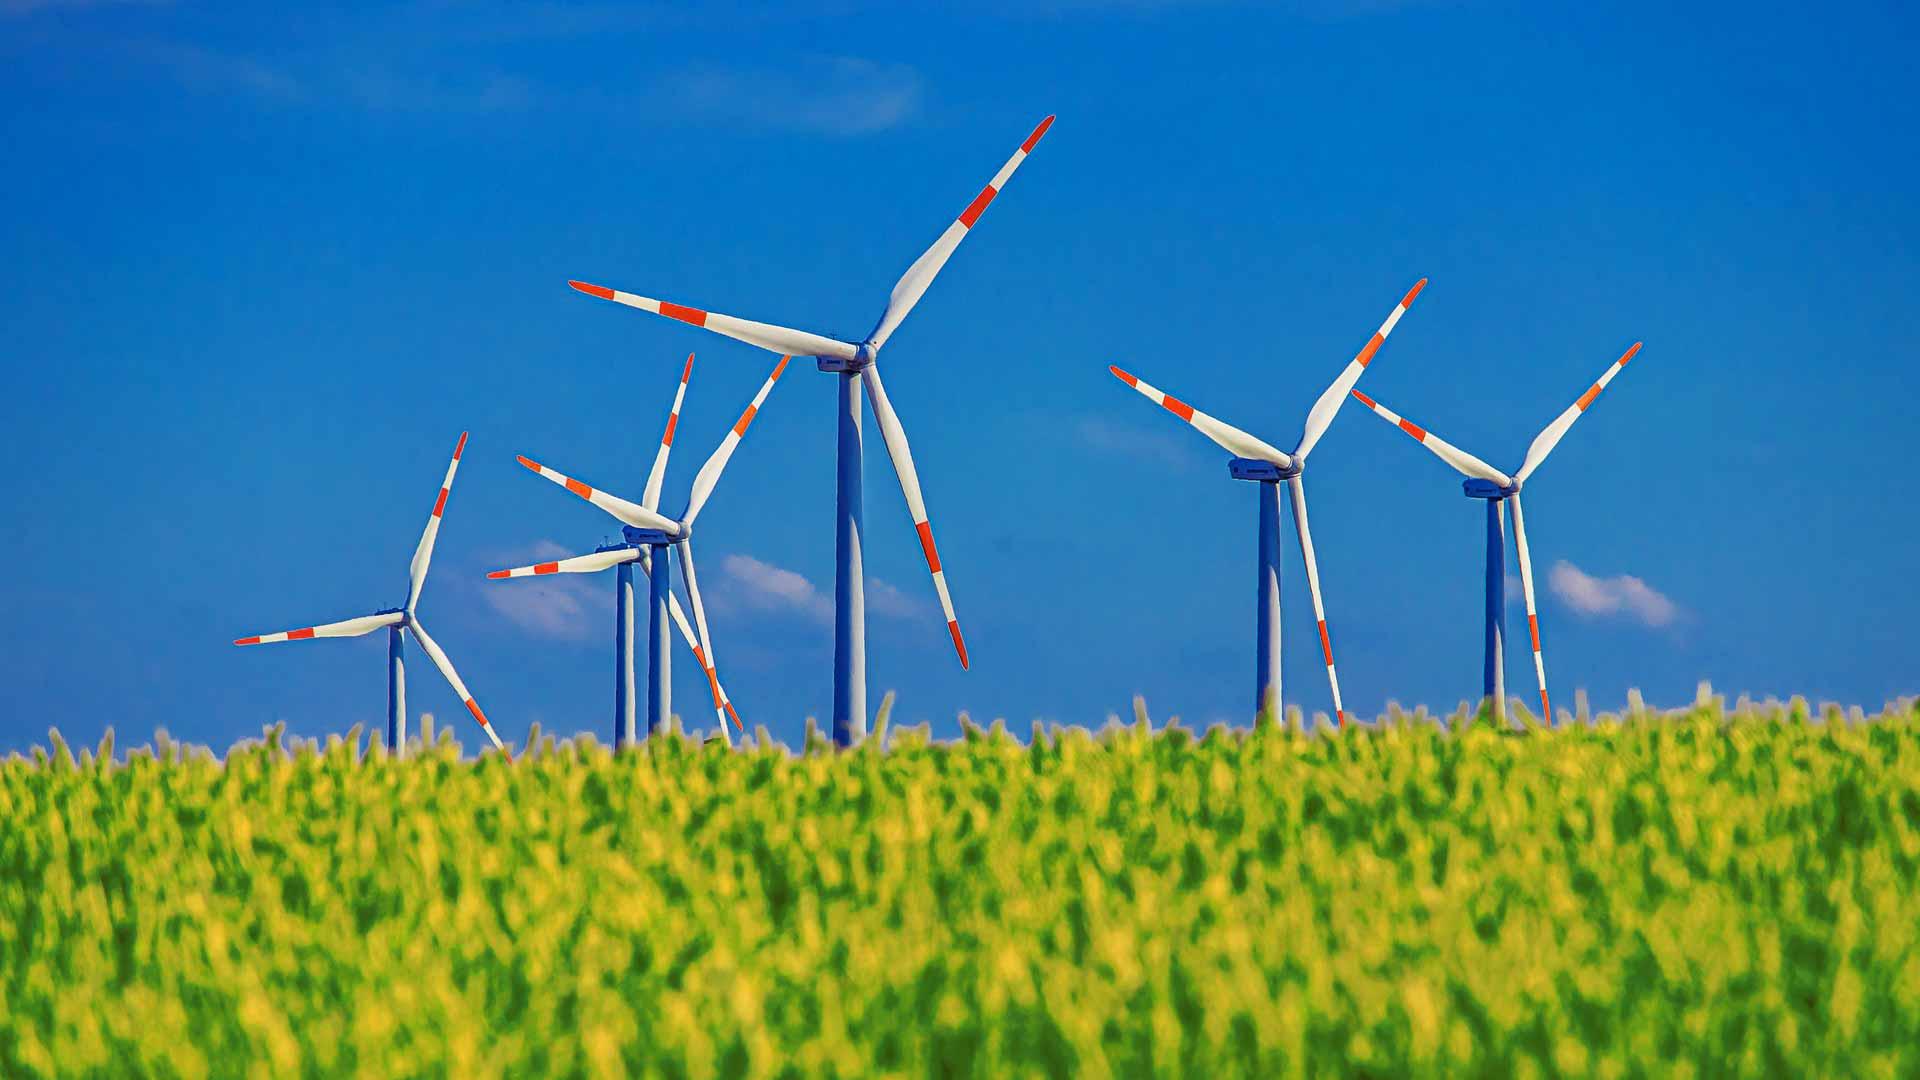 Pinwheel Field Cereals Sky Wind Energy Wind Power